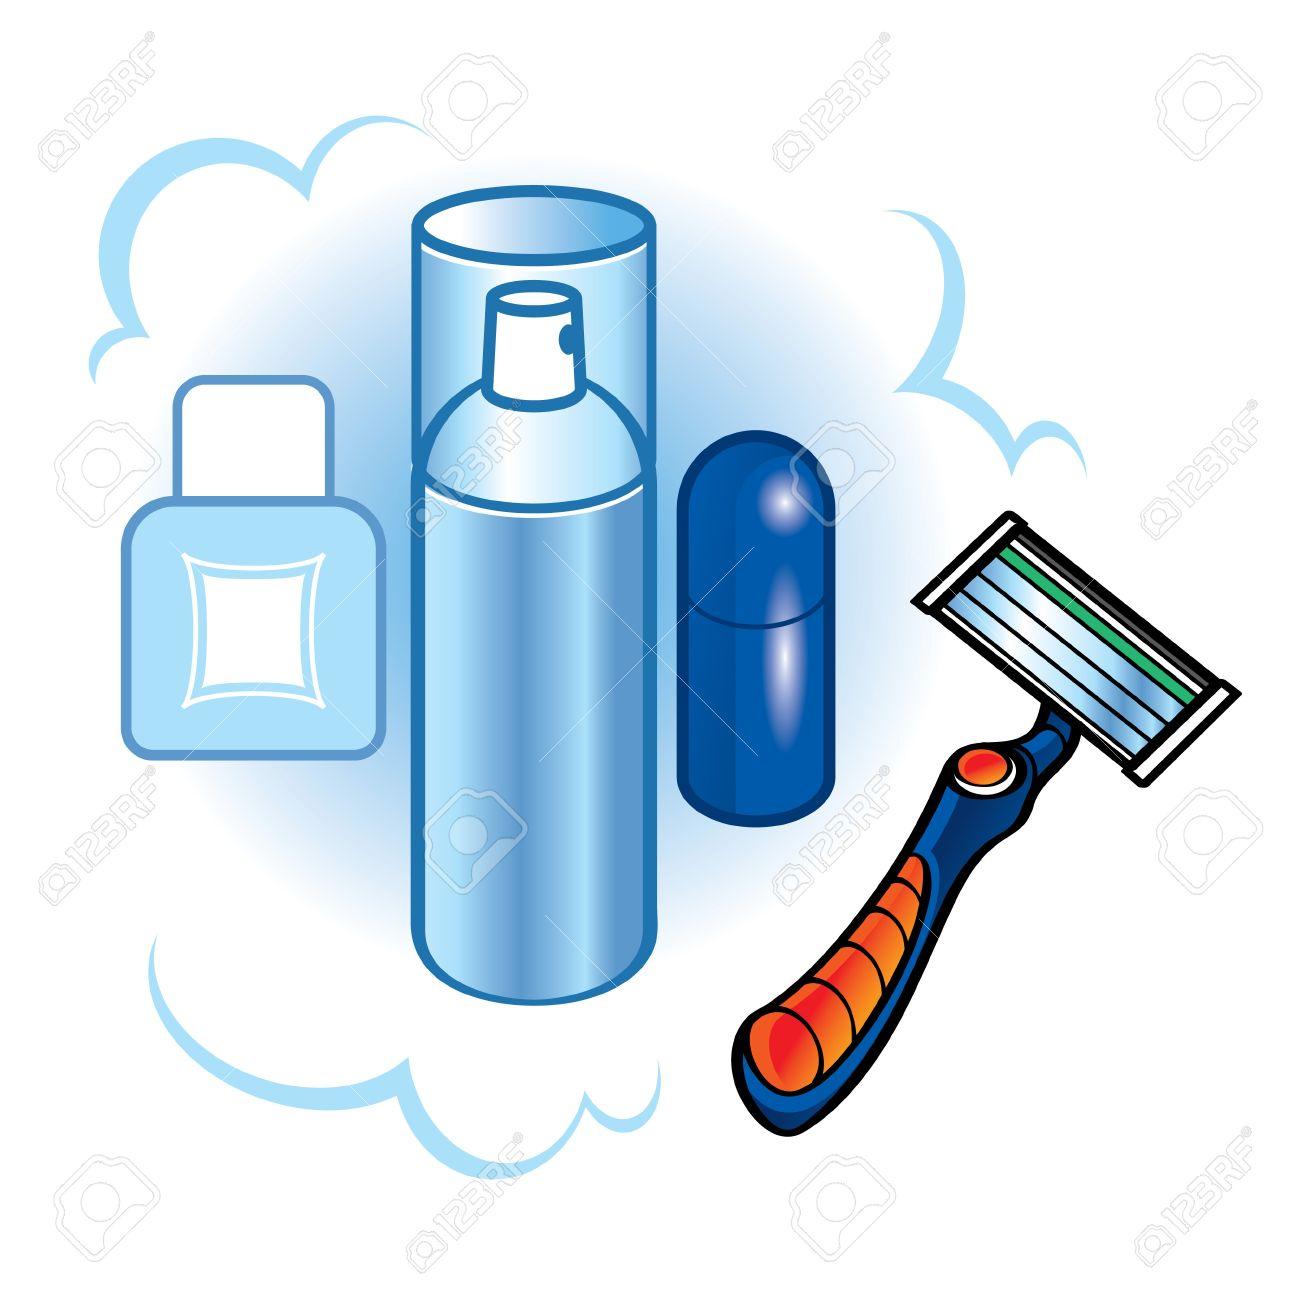 Shaving Foam Safety Razor Blade Body Care Hygiene Bathroom Royalty.